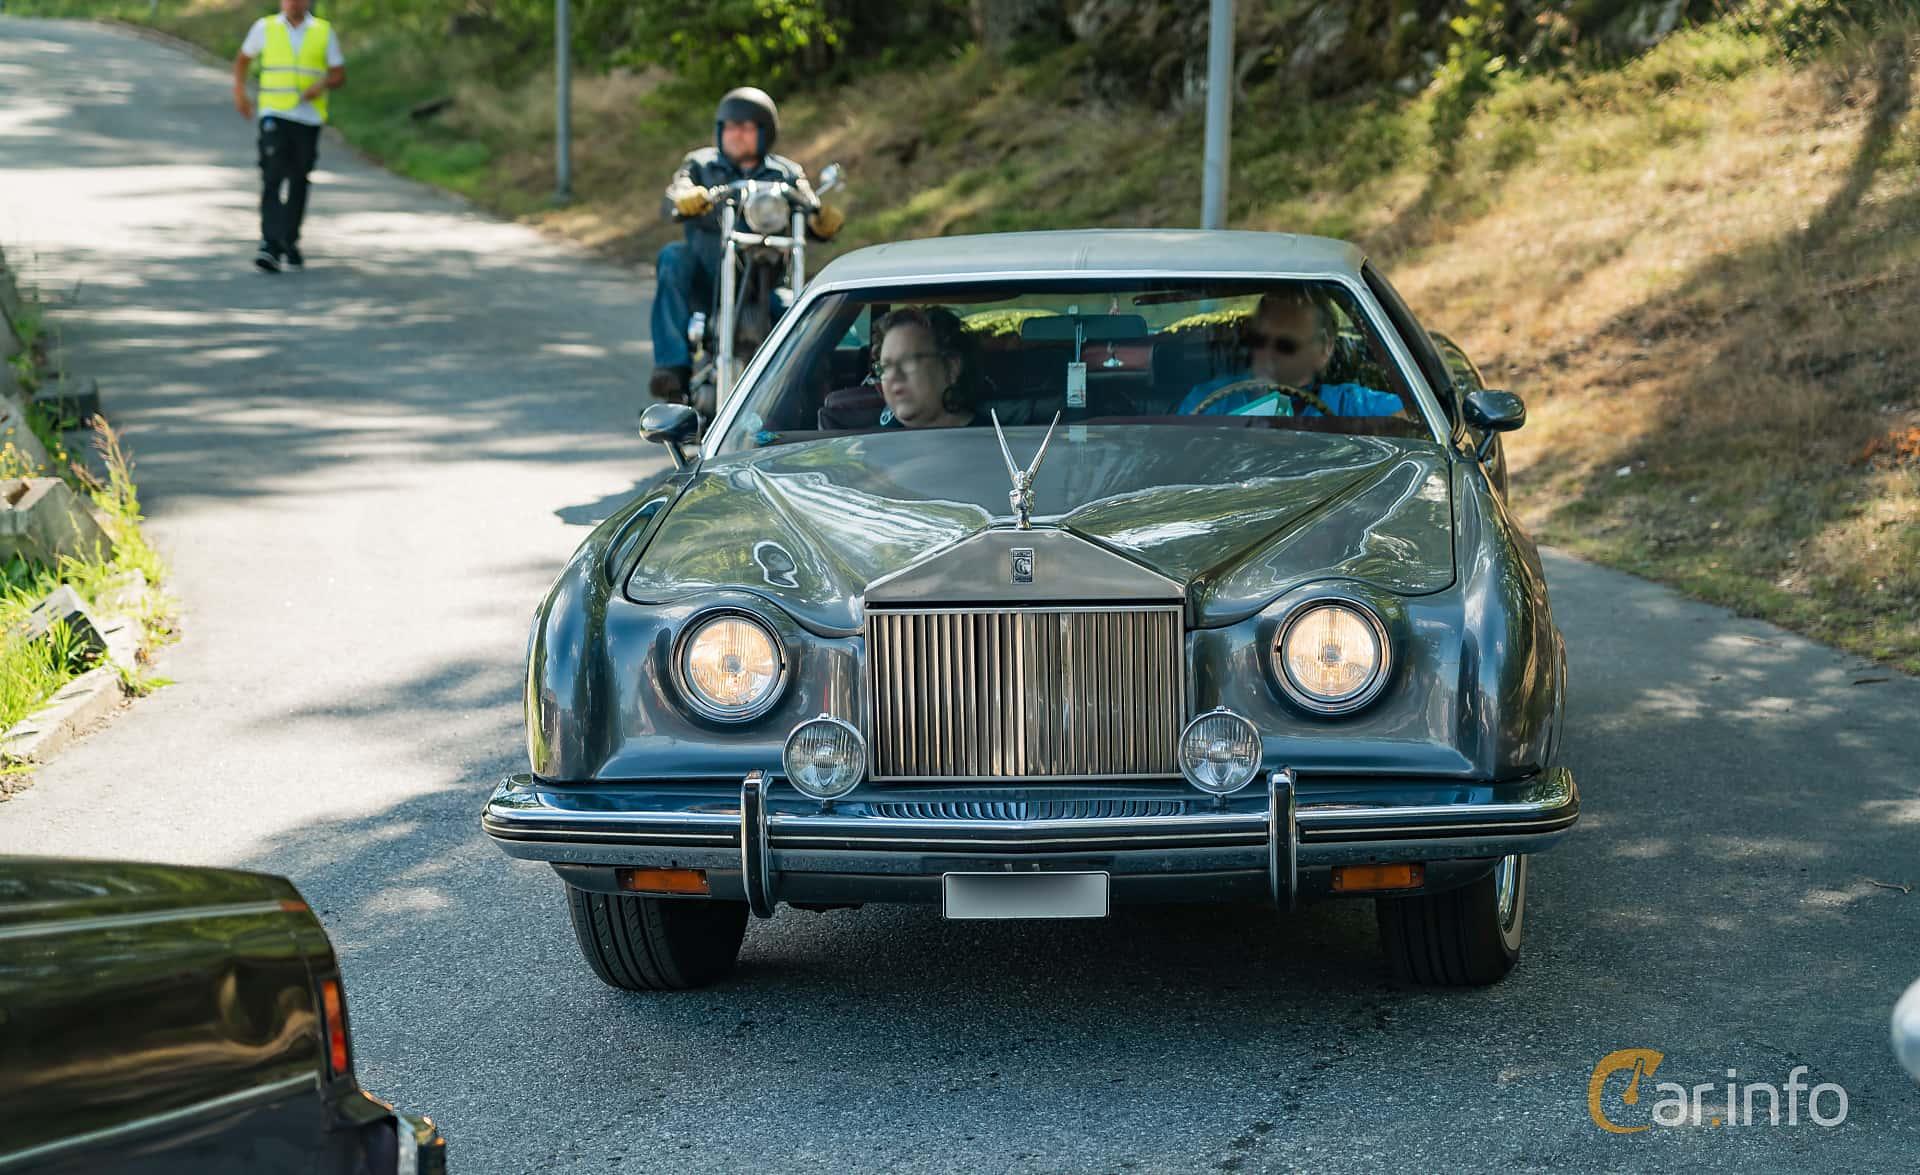 Chevrolet Monte Carlo 5.7 V8 Hydra-Matic, 177hp, 1976 at Stockholm Vintage & Sports Car meet 2019